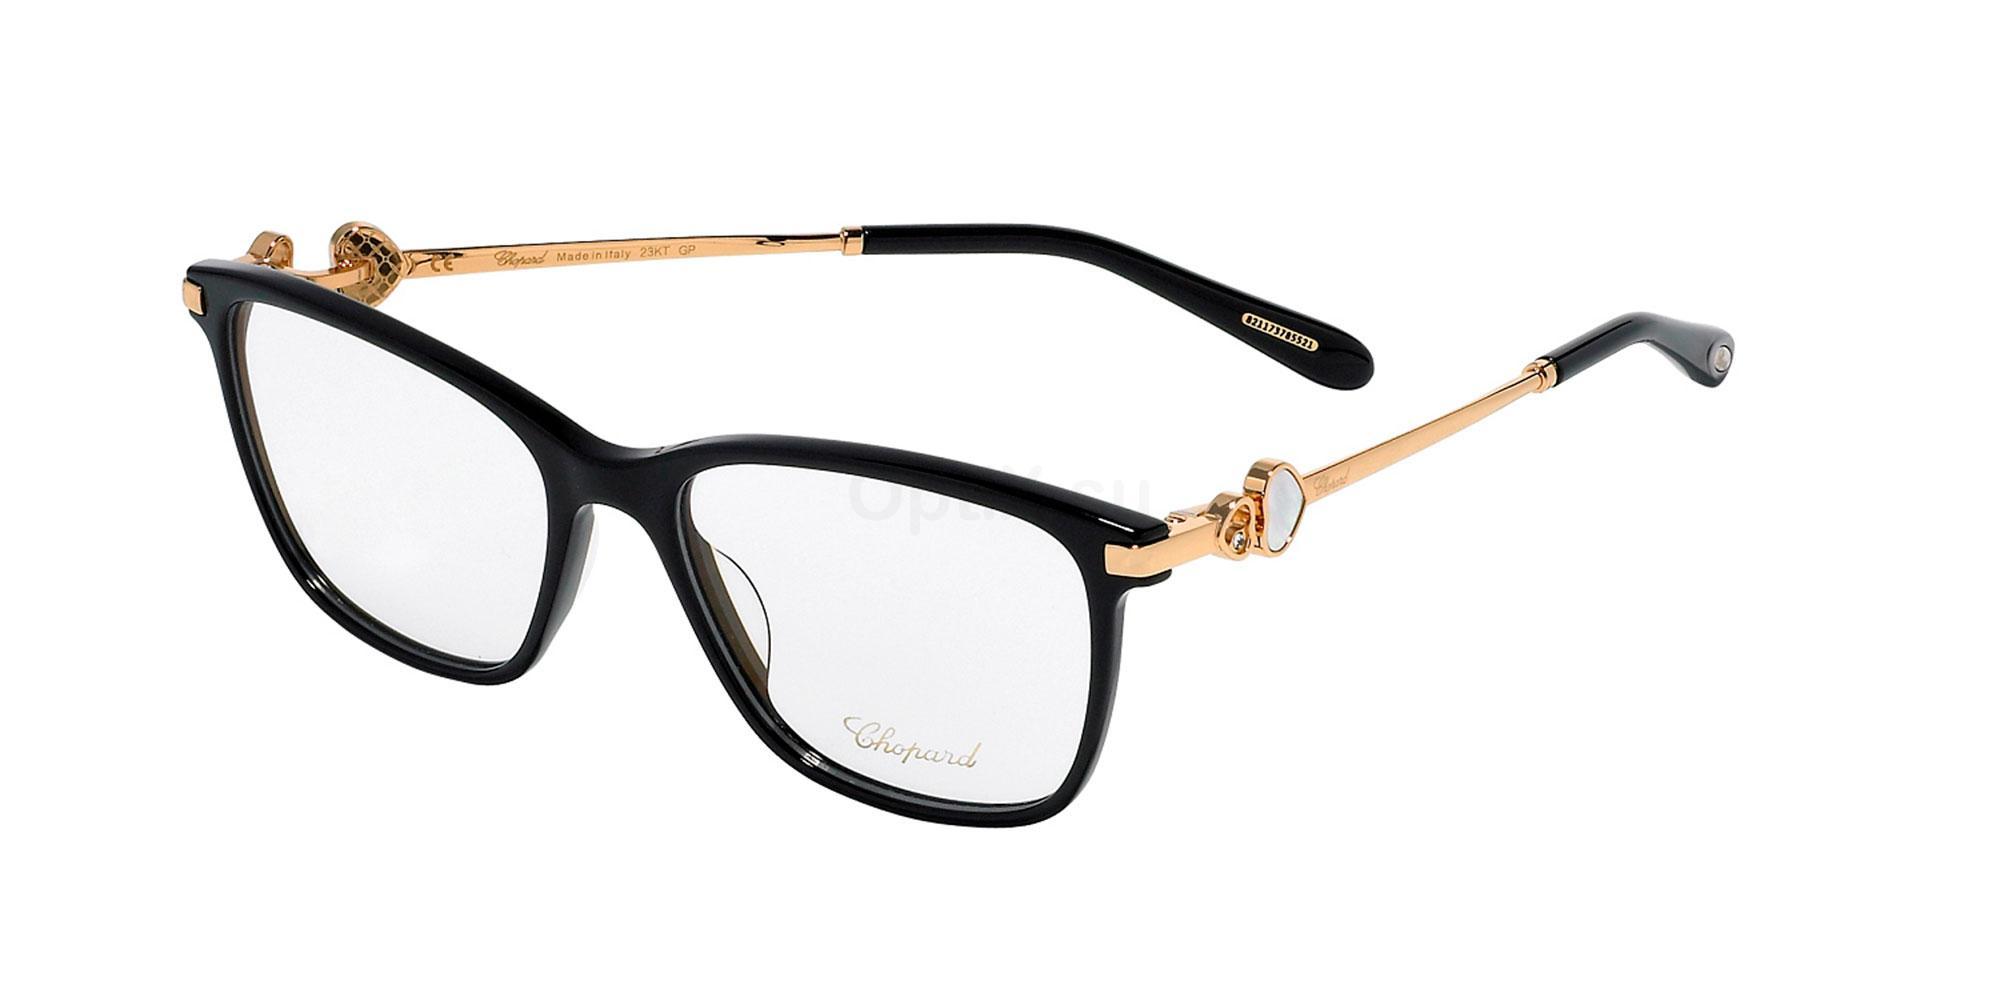 0700 VCH244S Glasses, Chopard